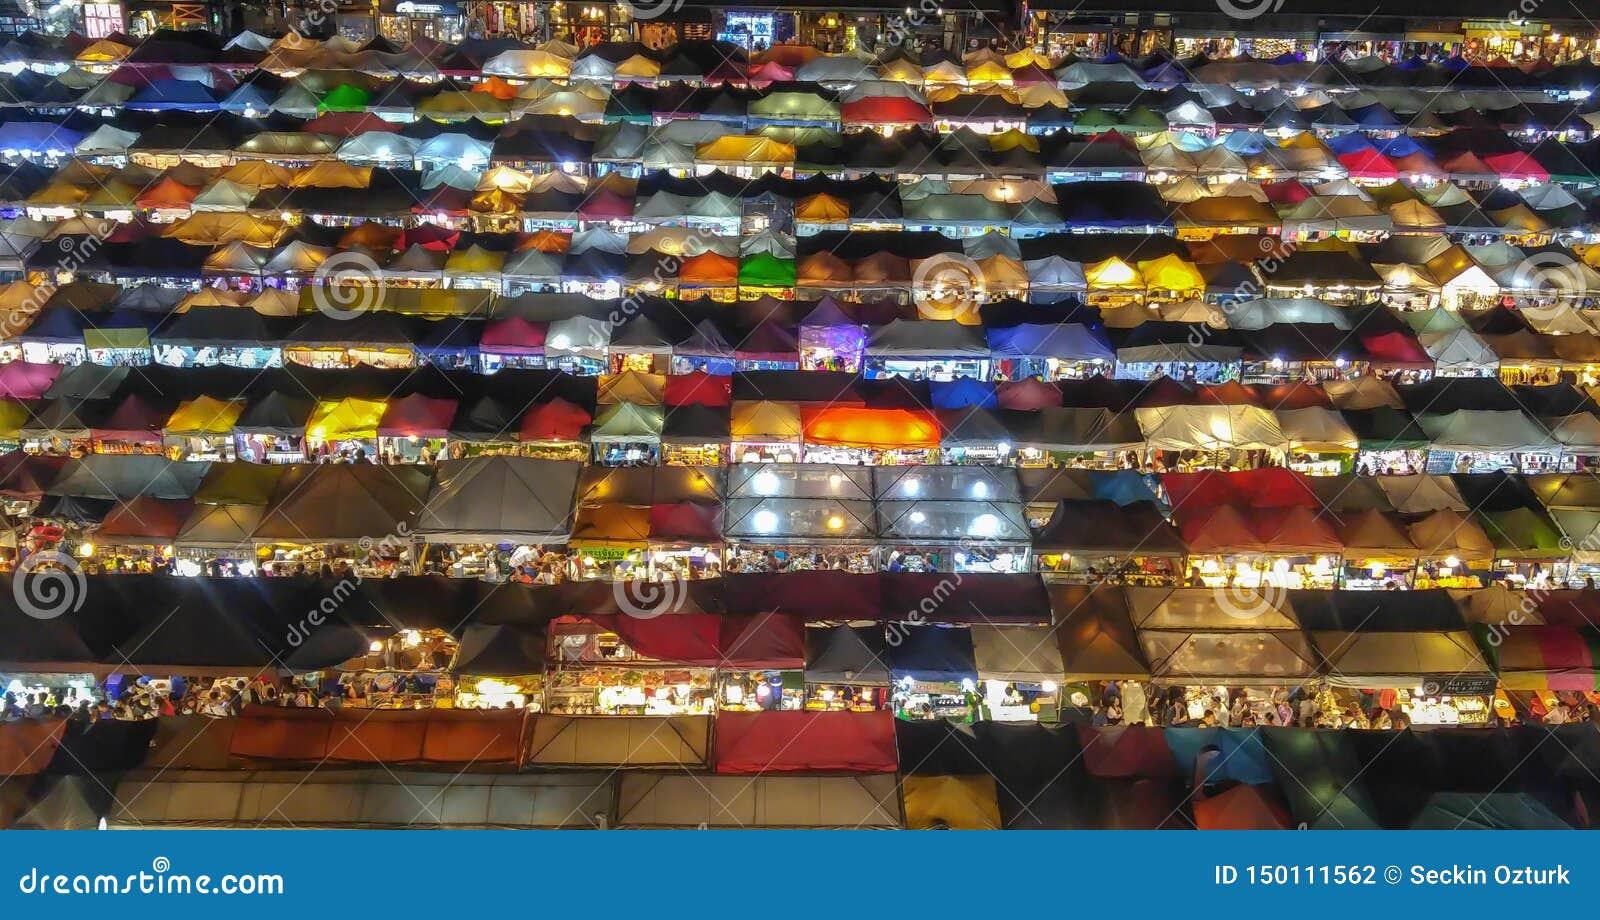 Colorful Night Market in Bangkok